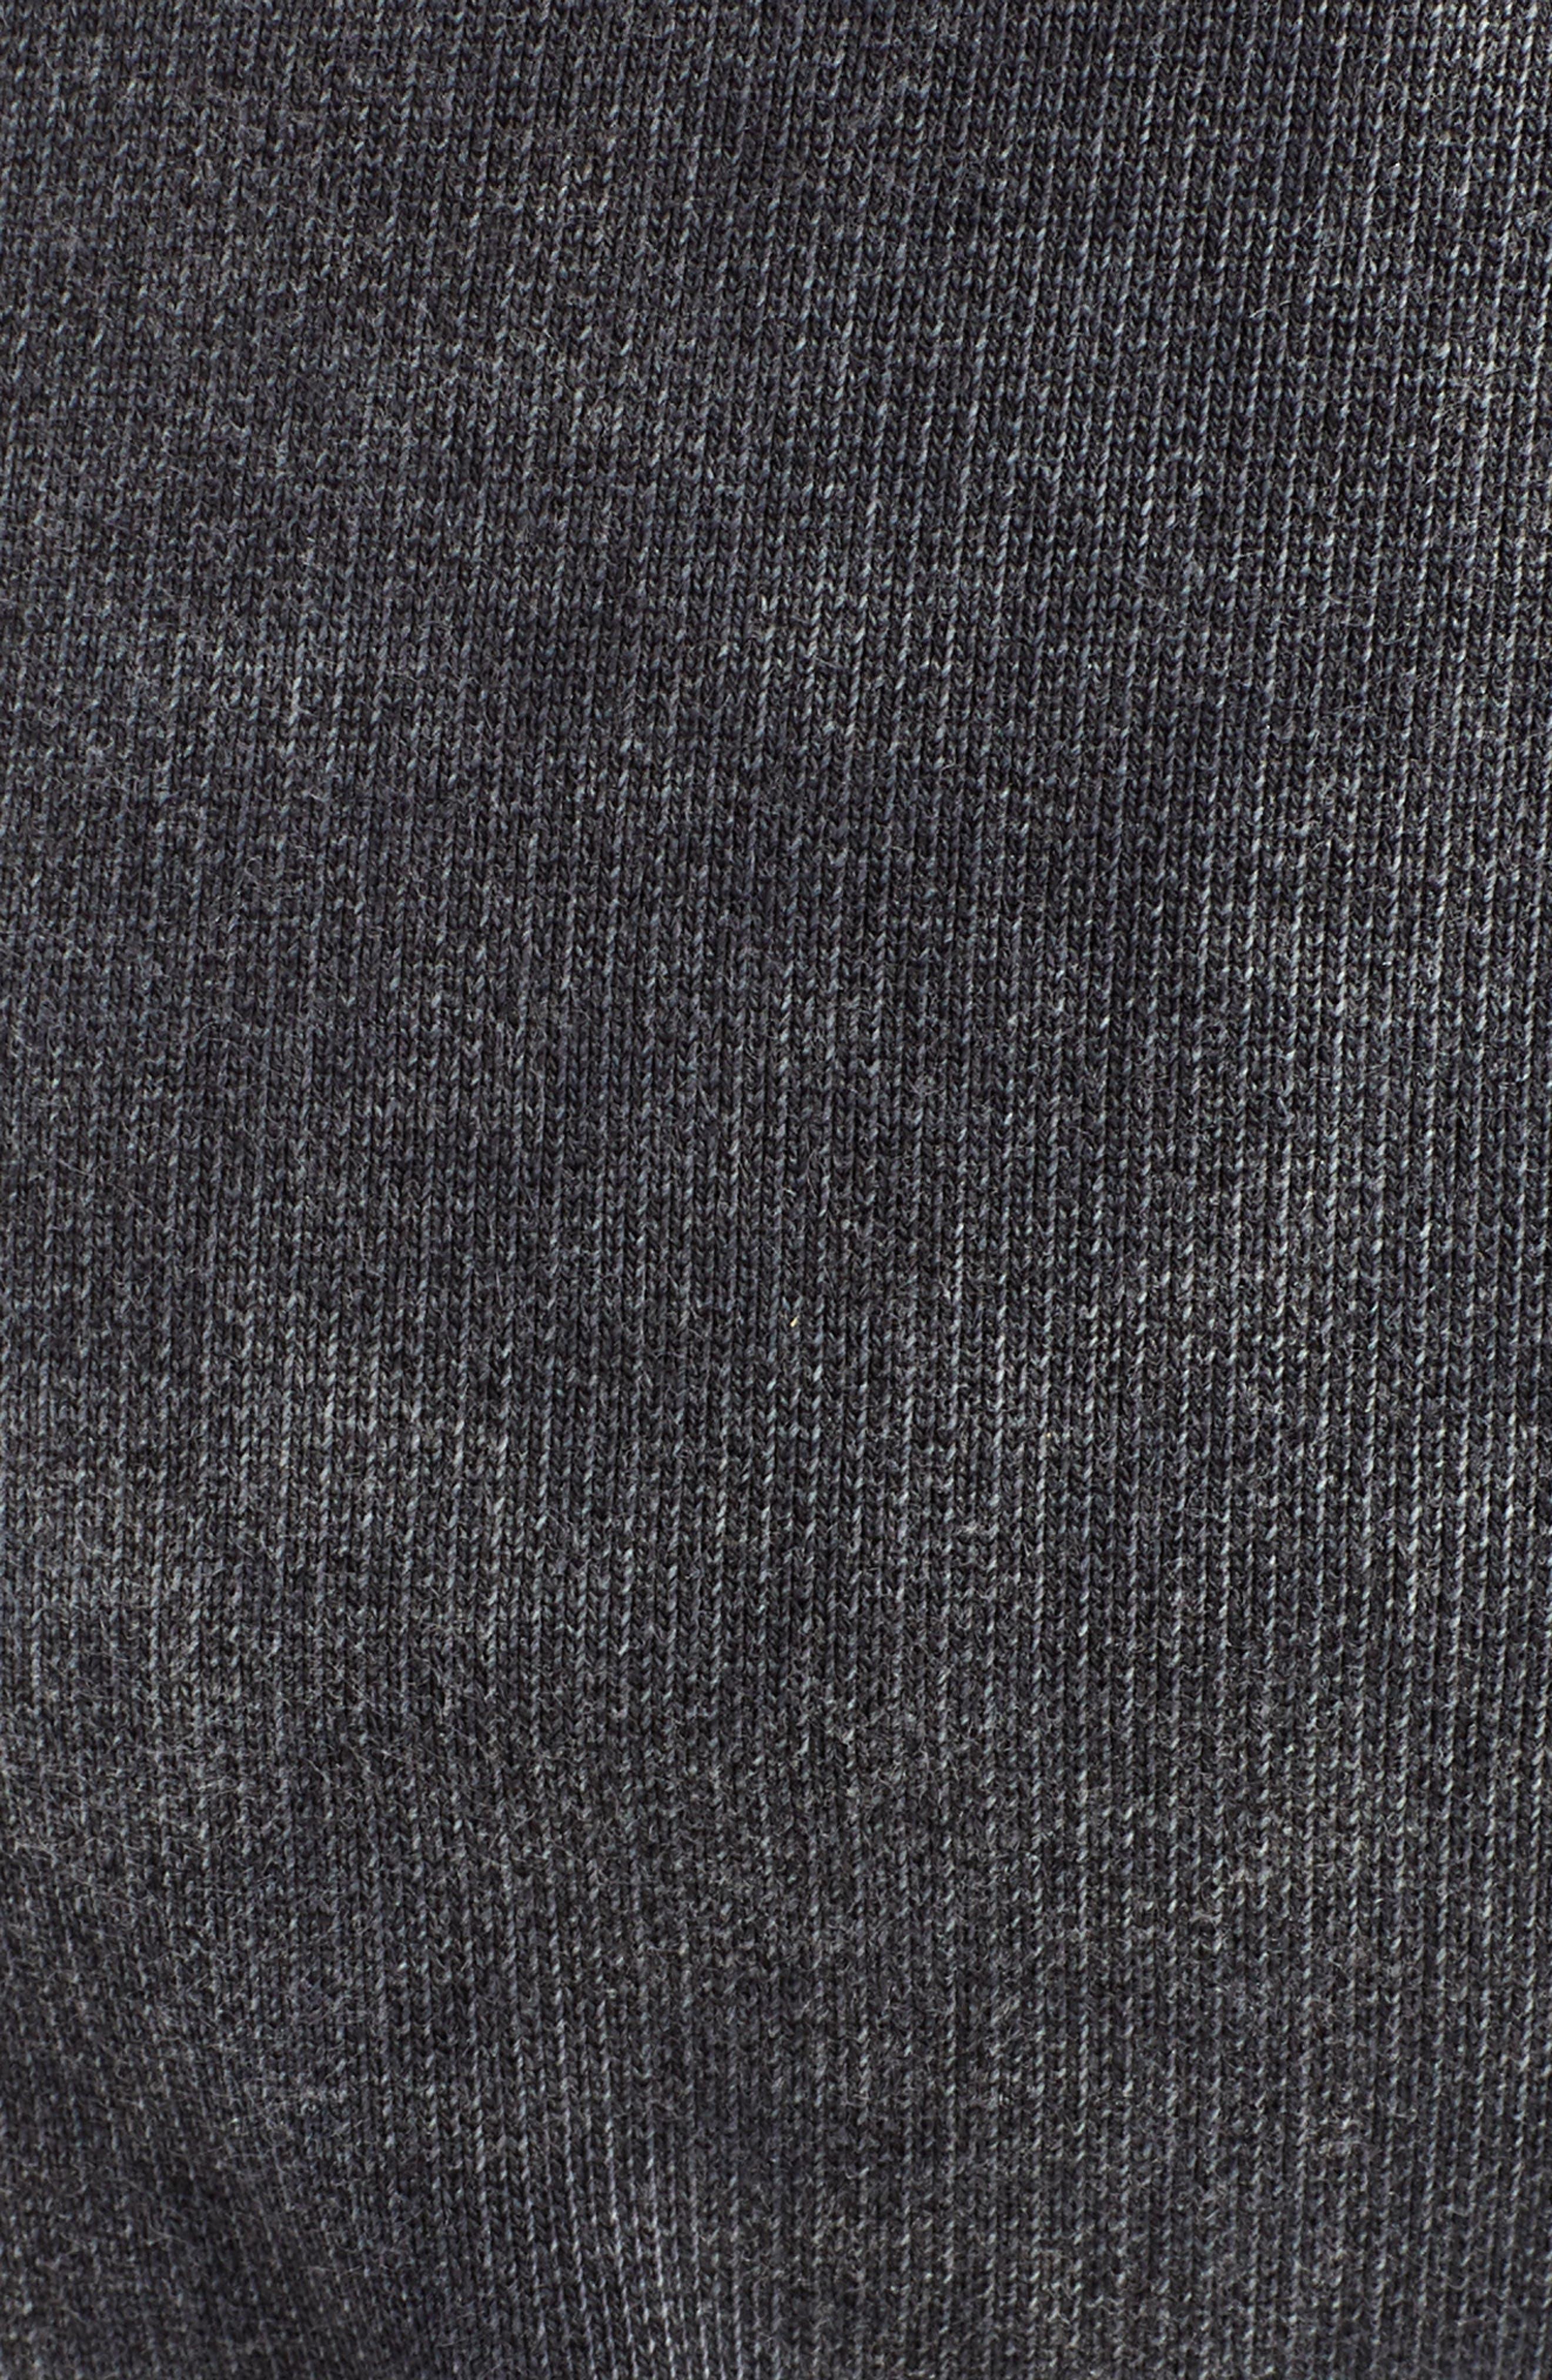 THE KOOPLES, Slim Fit Track Pants, Alternate thumbnail 5, color, BLACK WASHED